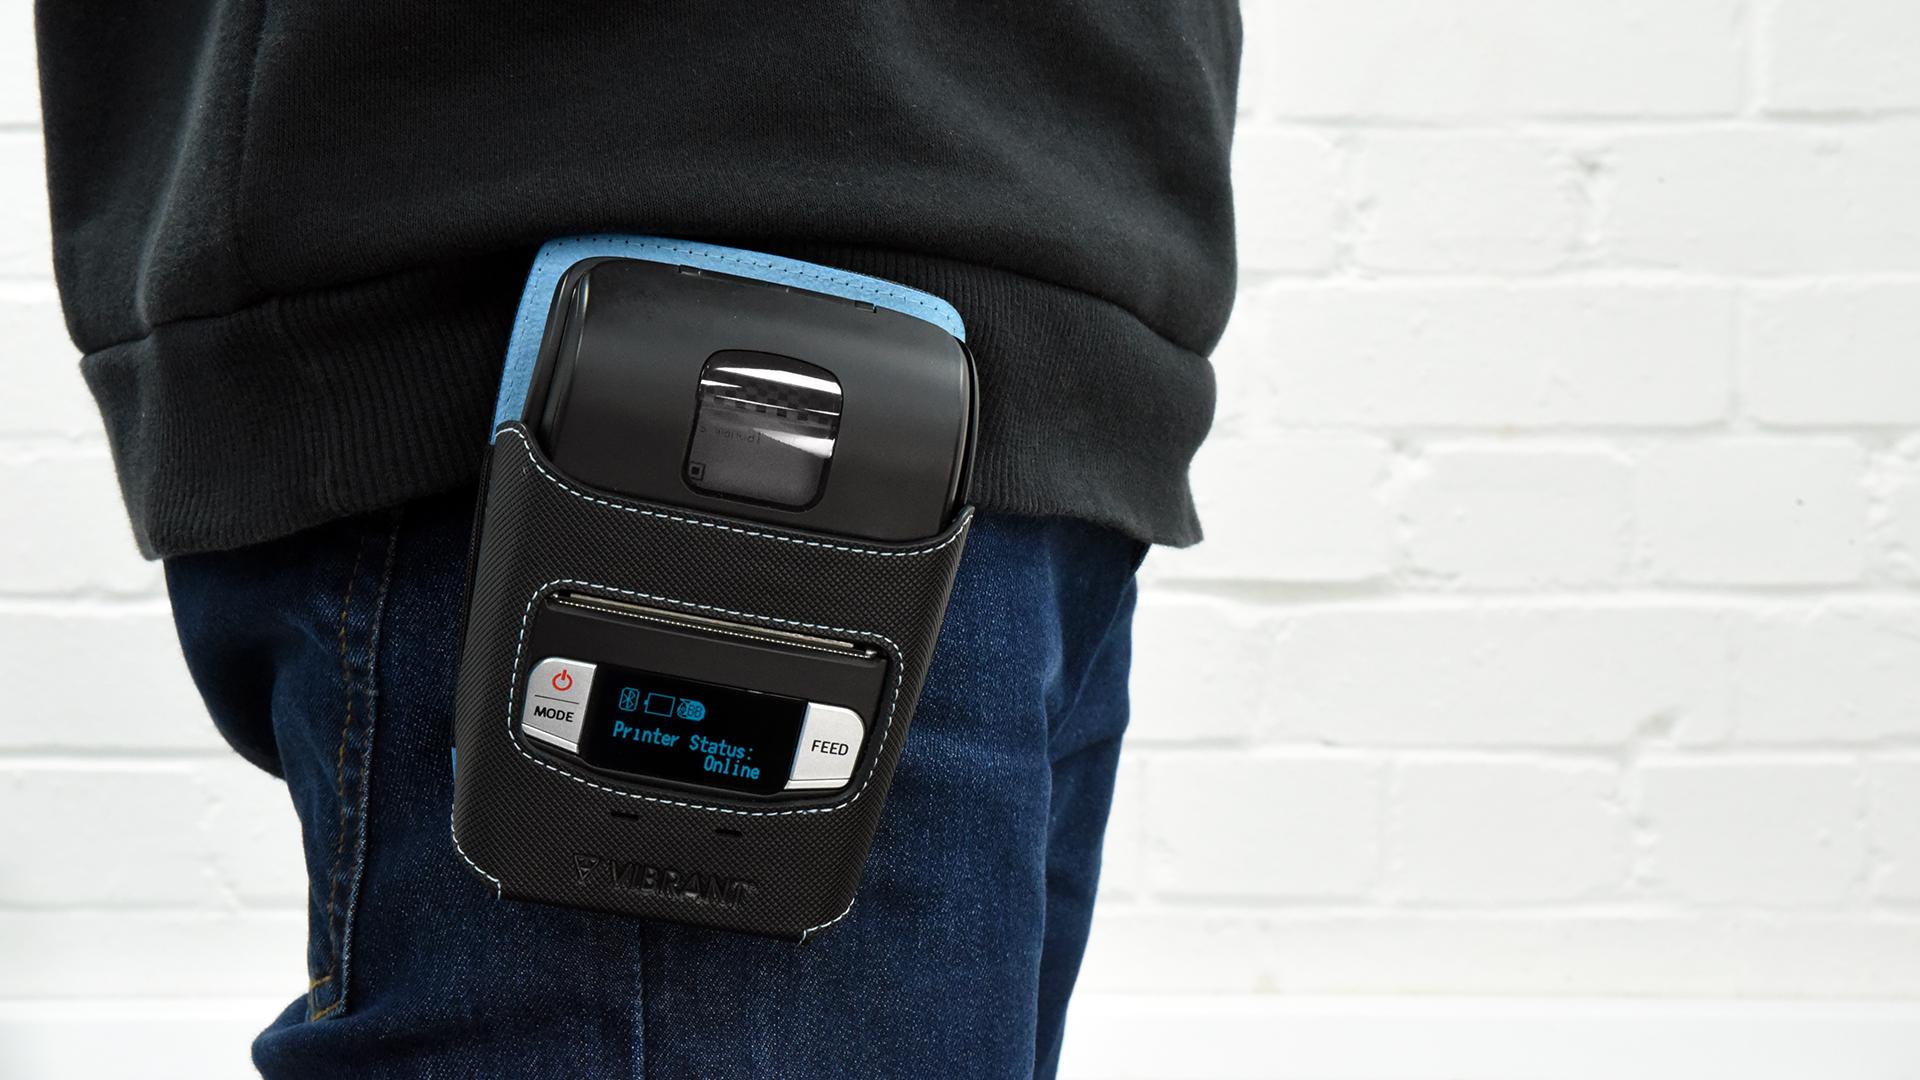 Vprint Mobile bluetooth printer holster case Grid 2.png